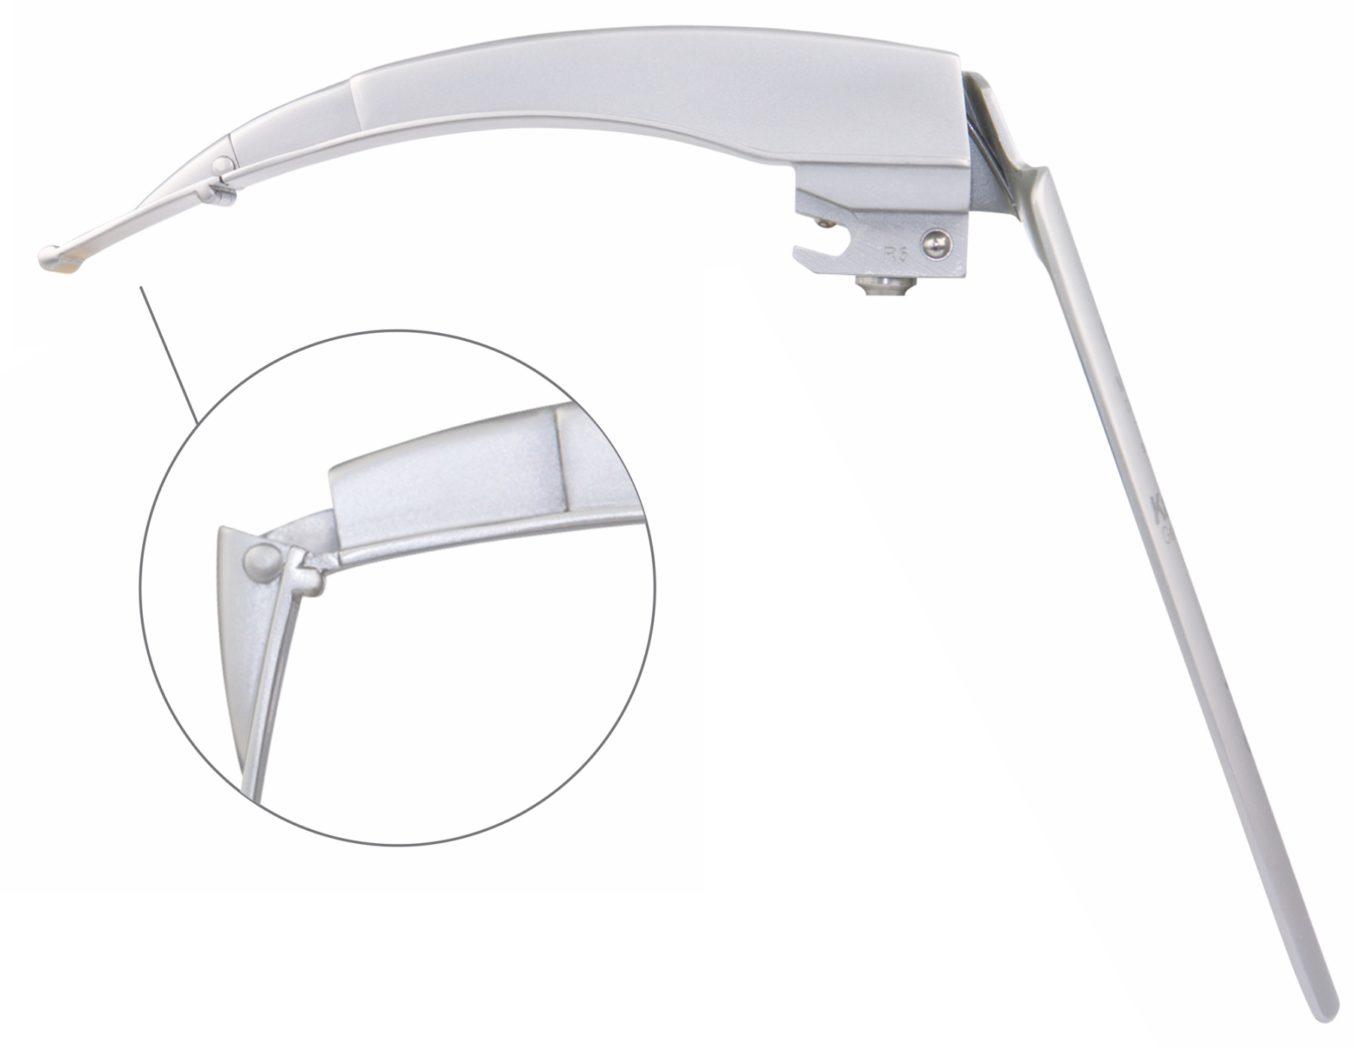 KaWe FLAPLIGHT F.O. MEGALIGHT Reusable Laryngoscope Blade